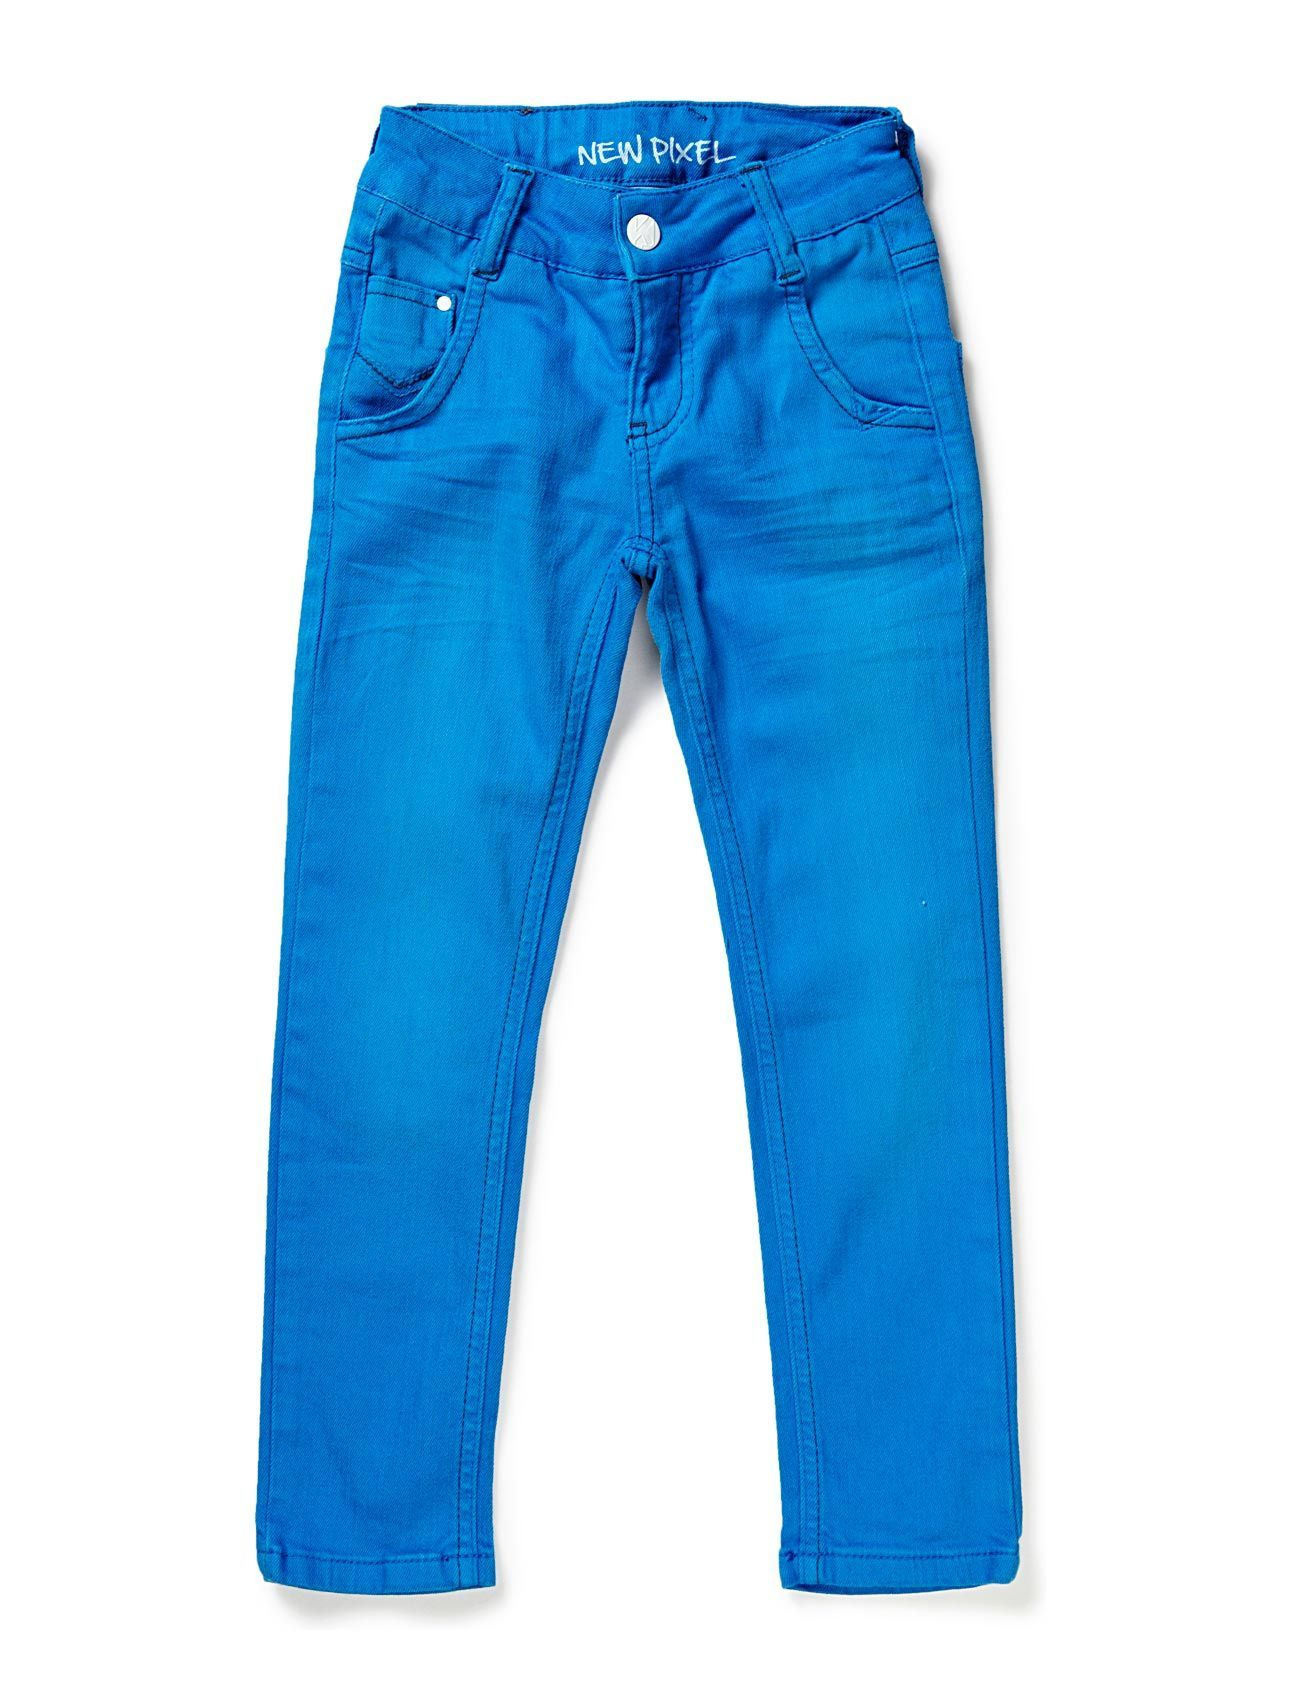 Pants New Pixel